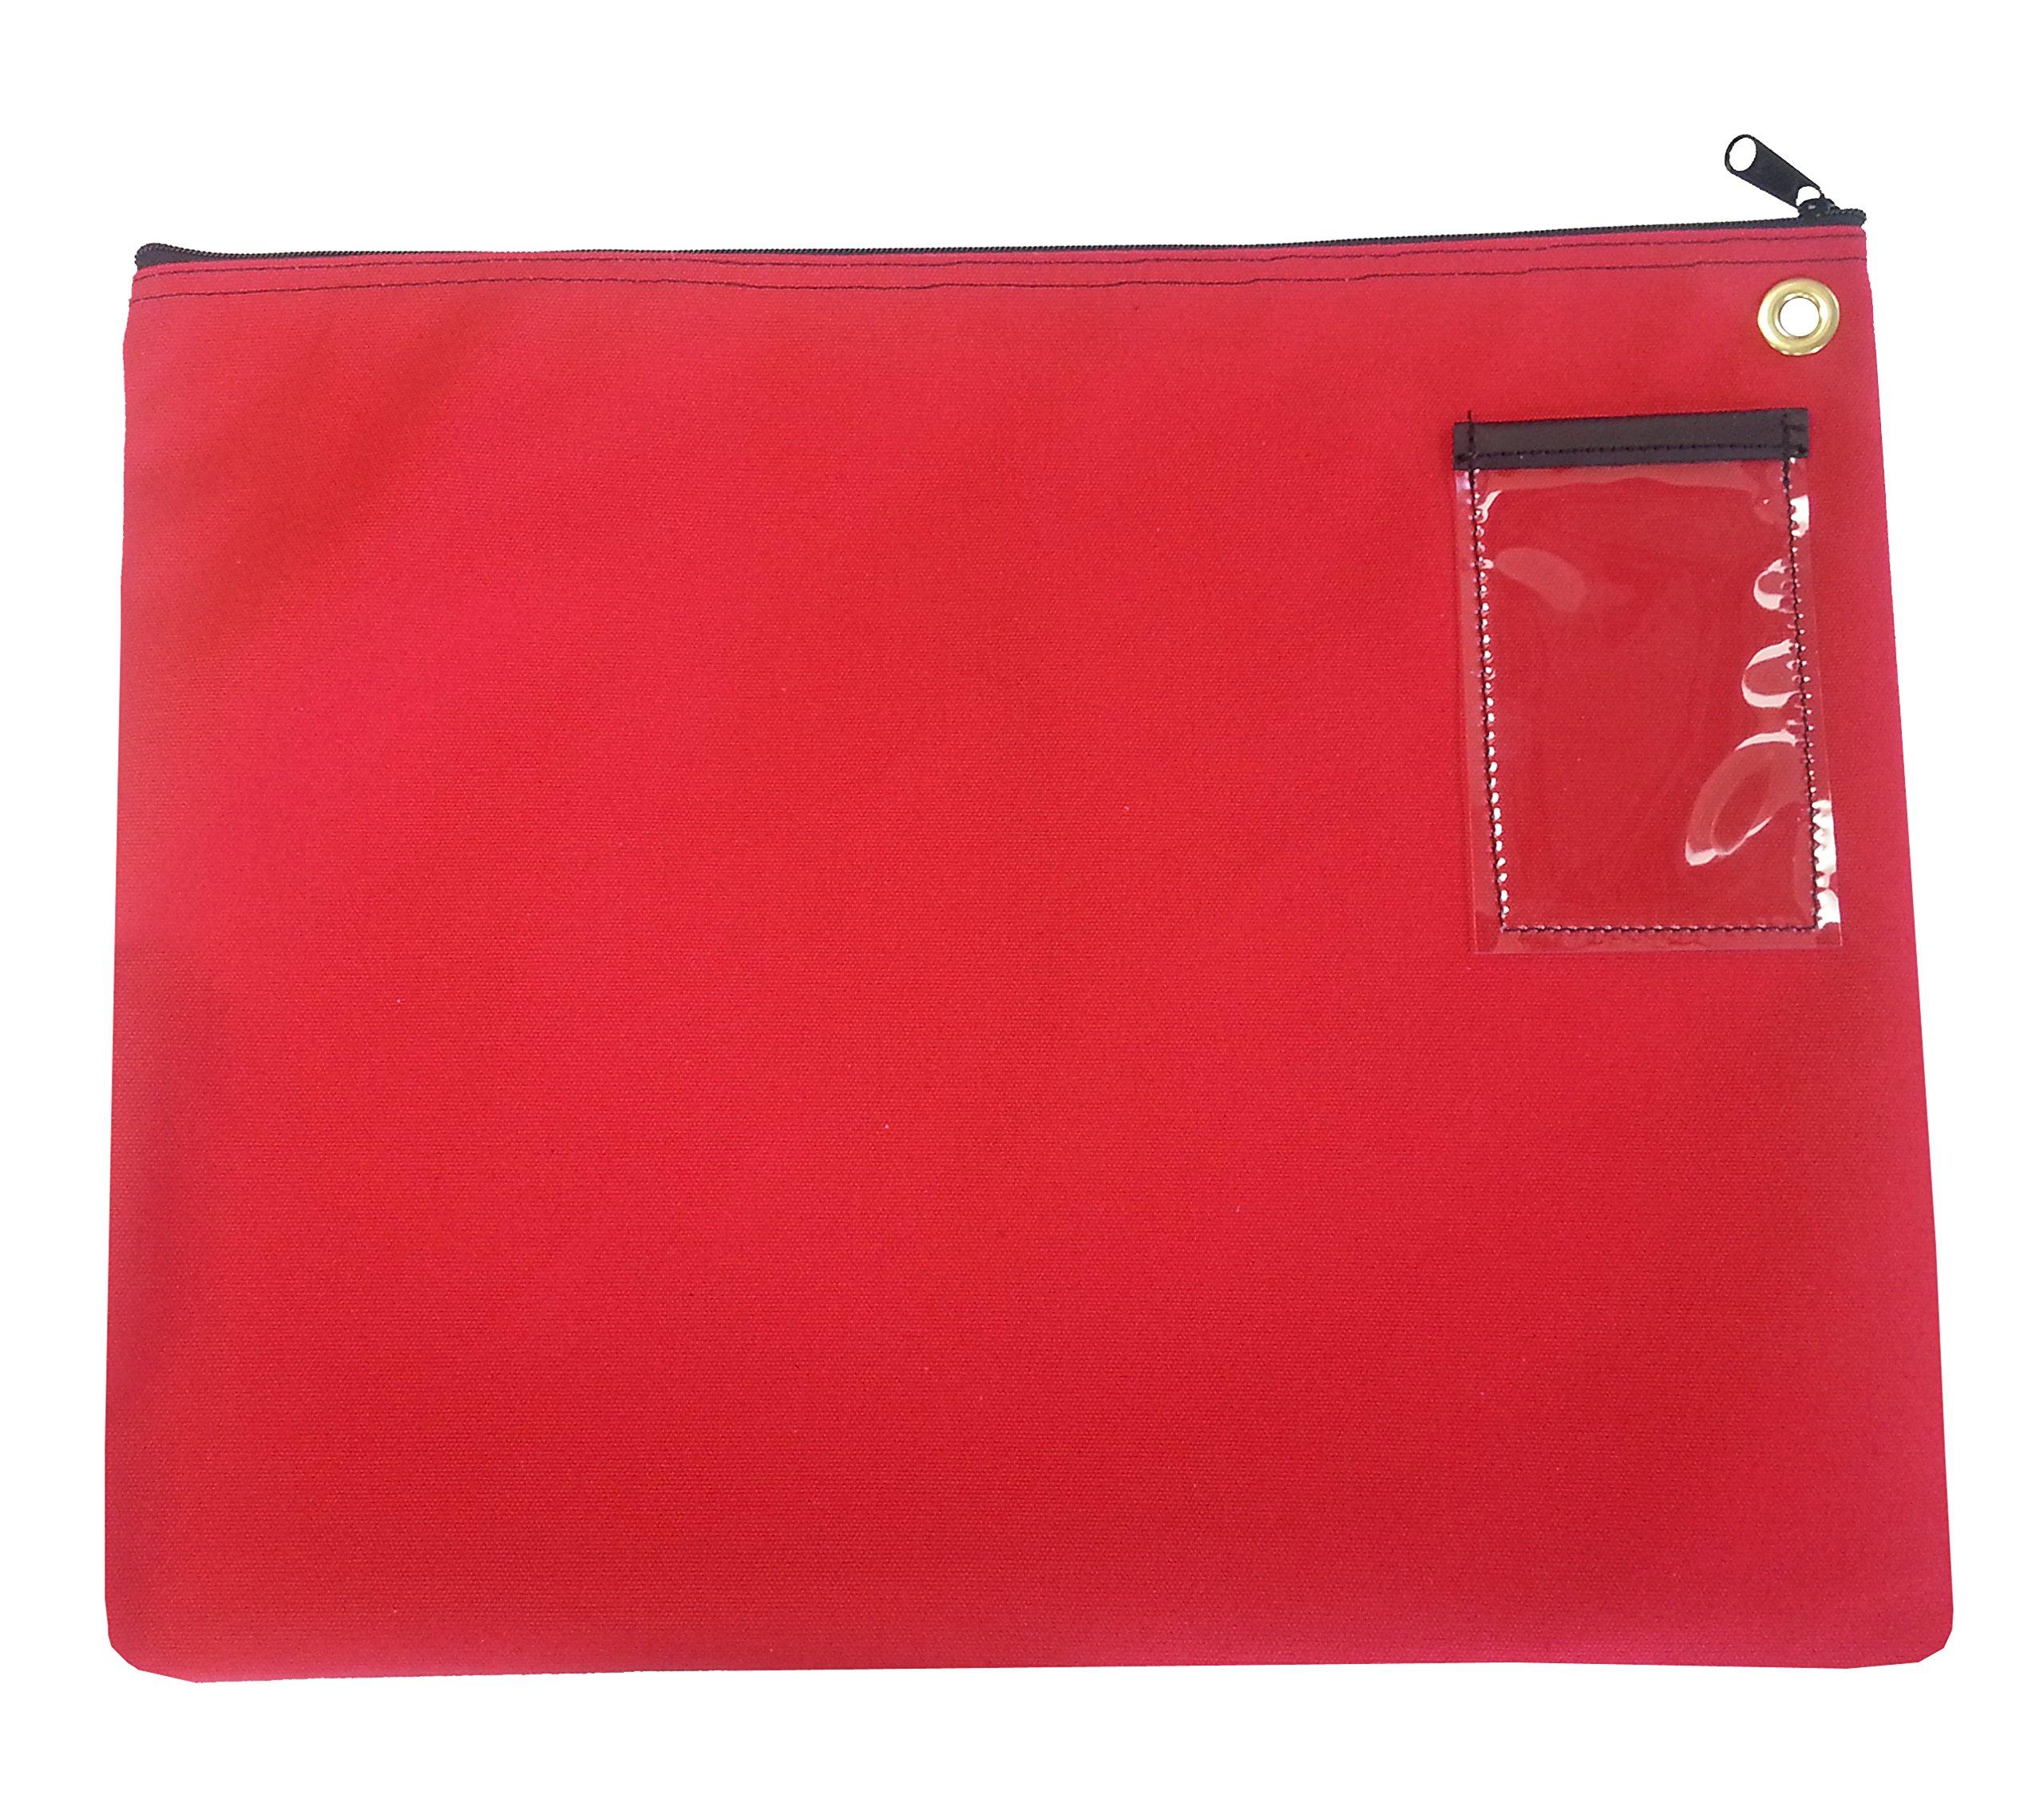 Interoffice Mailer Canvas Transit Bag 14''w x 11''h (Red)